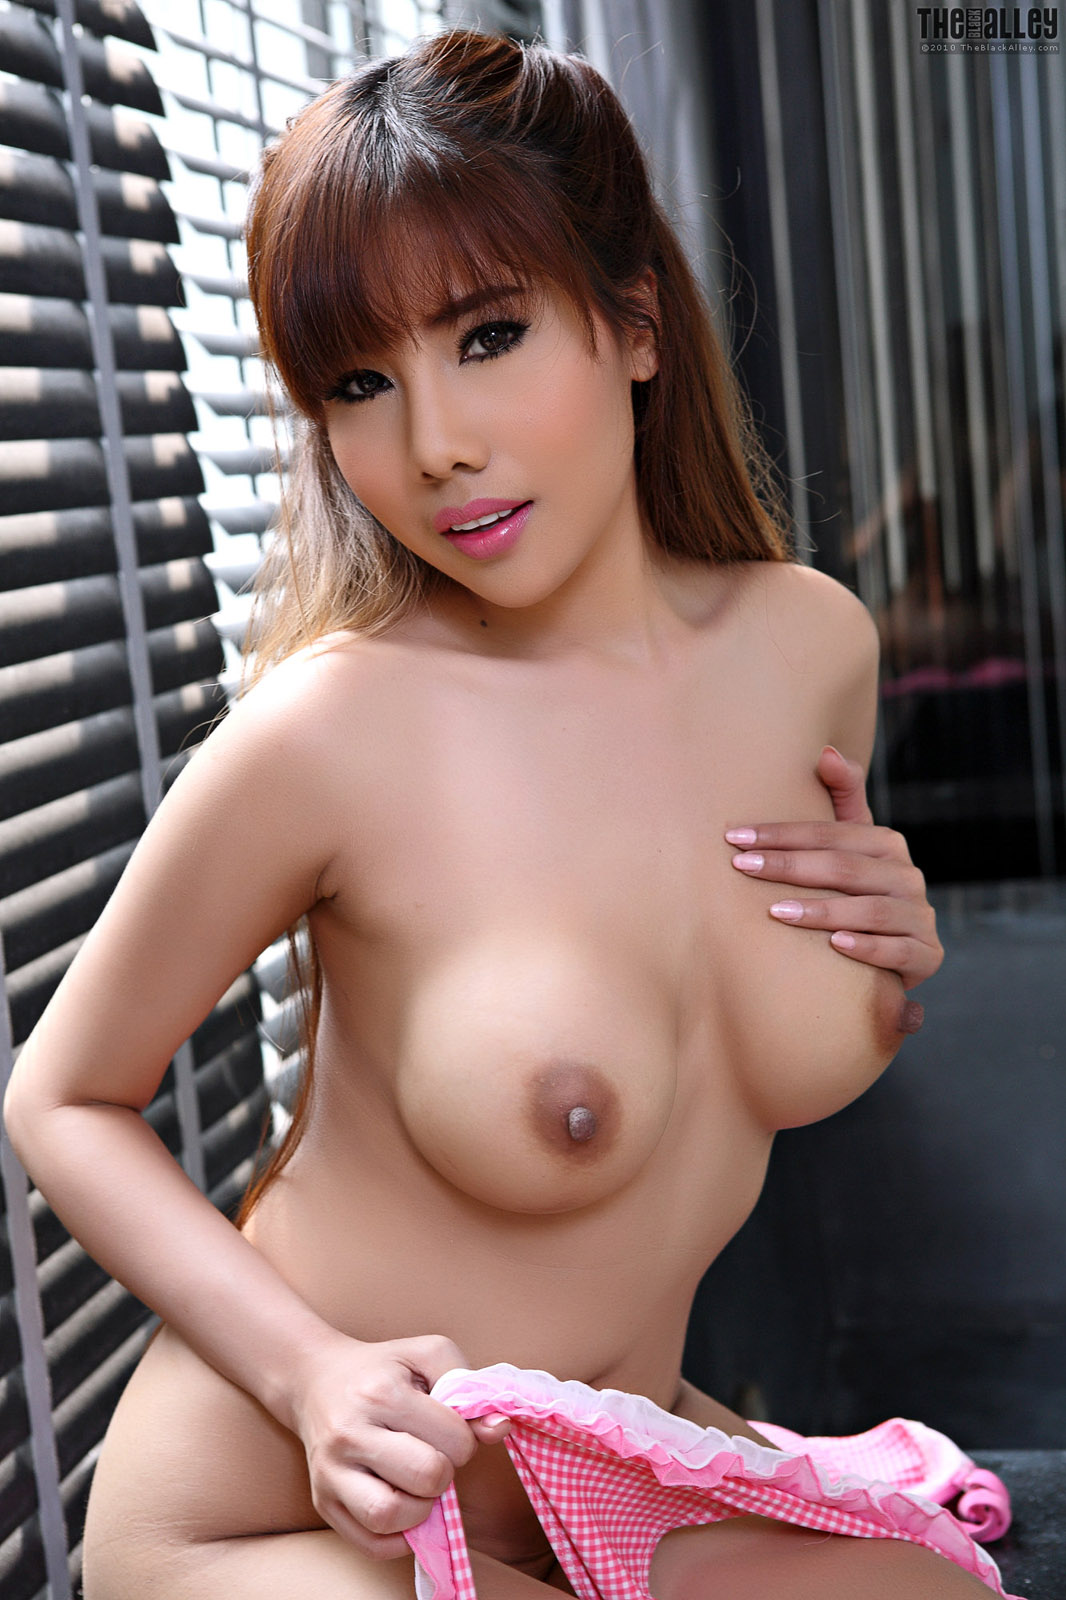 nude arab models